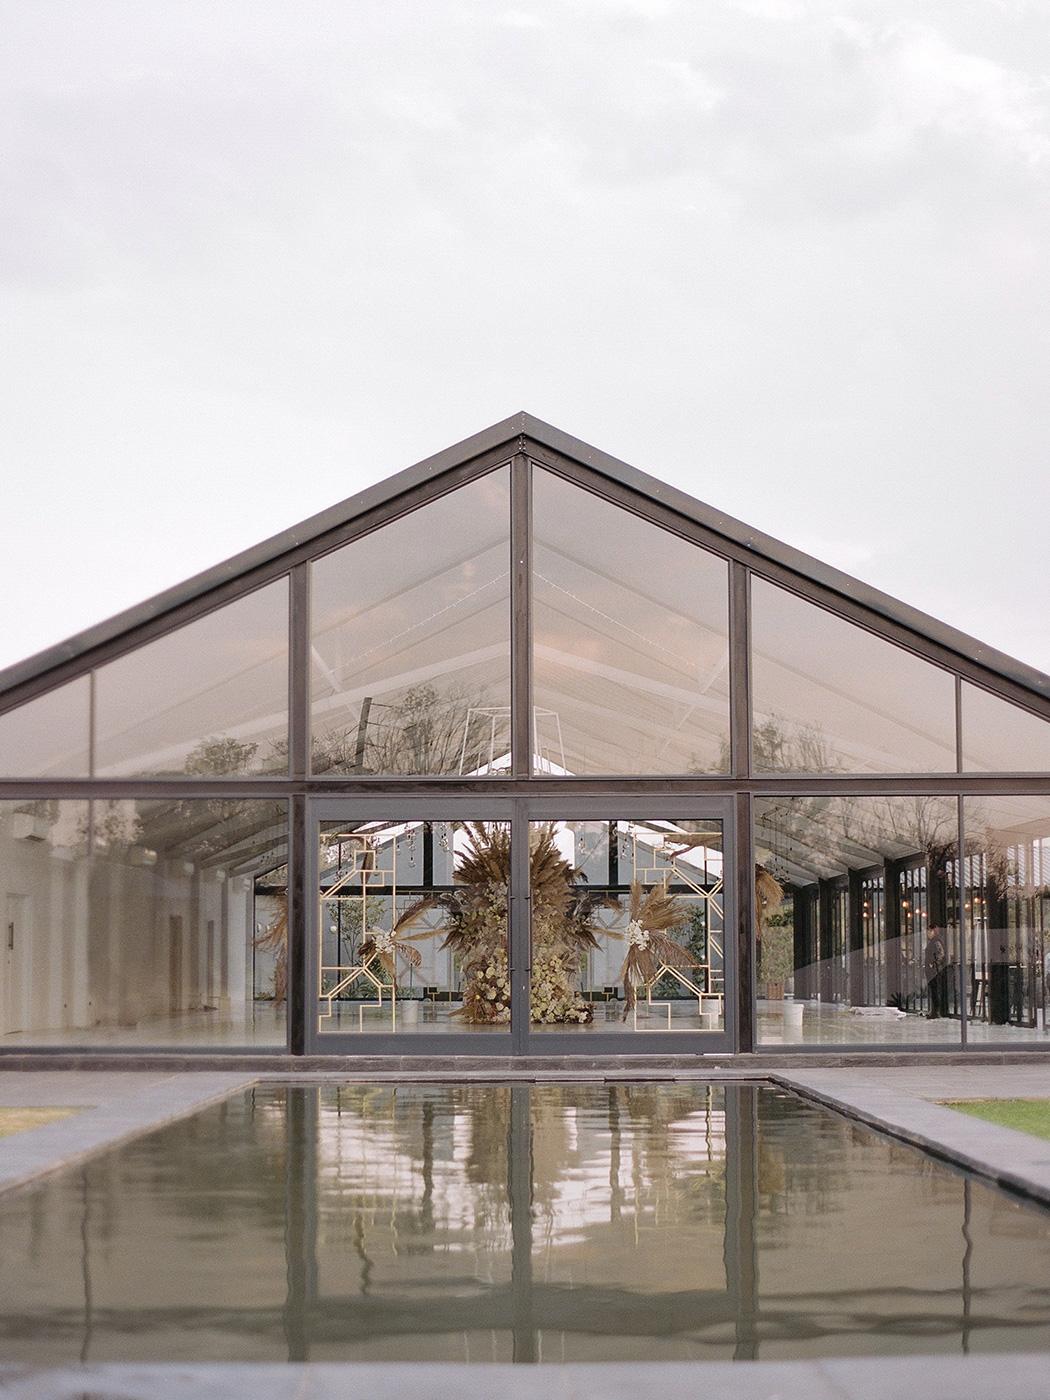 Inimitable Wedding Venue | Rensche Mari